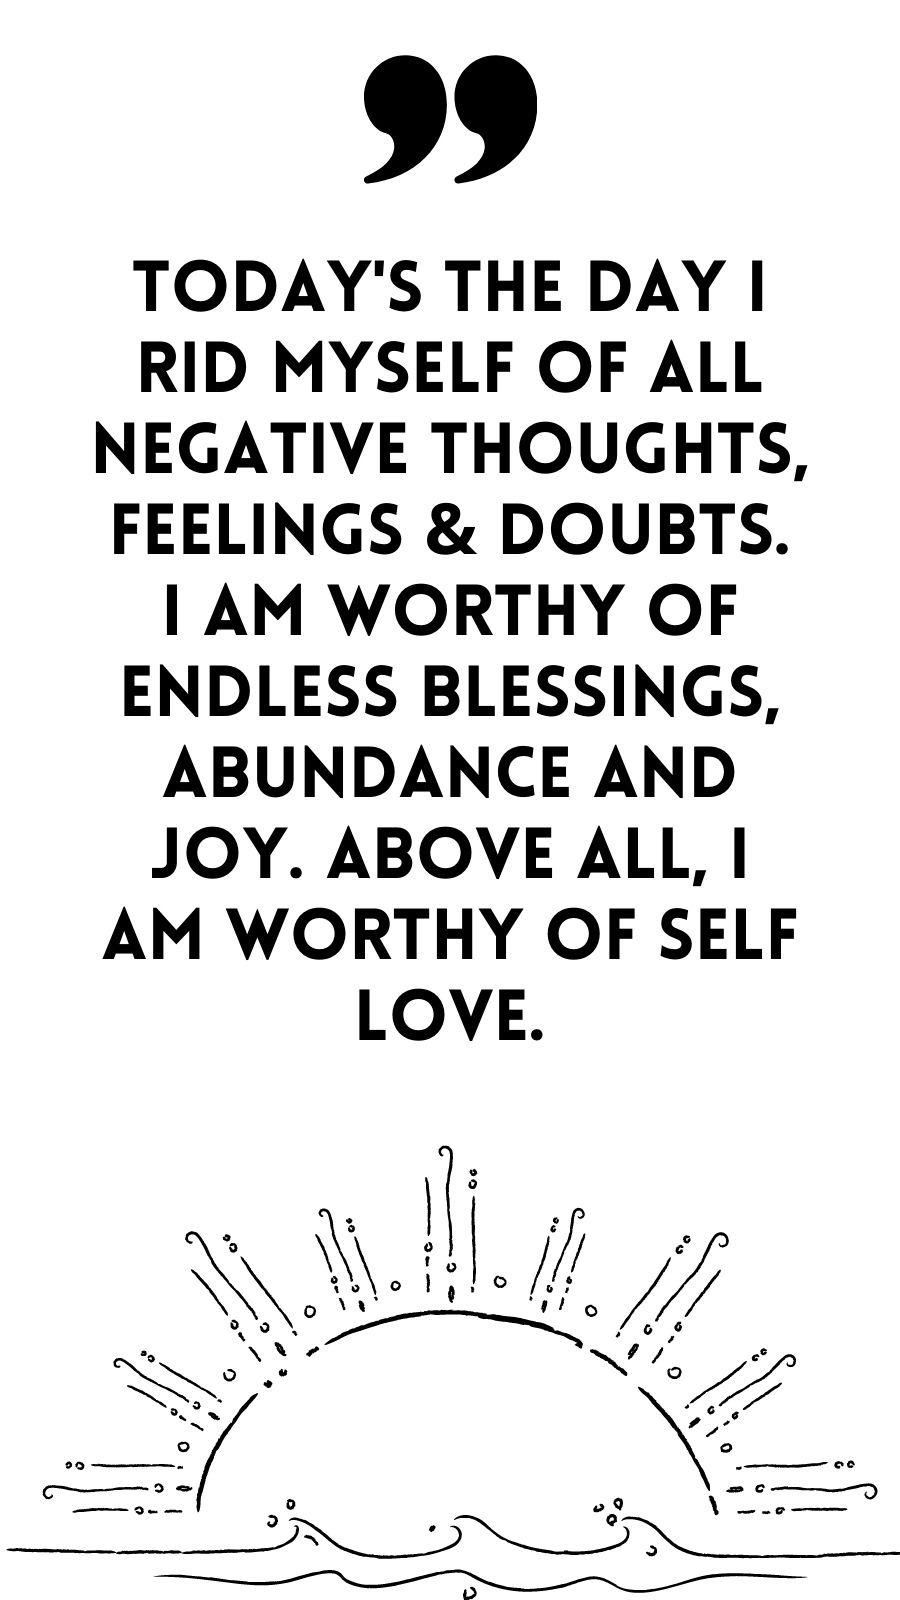 Self Love, Abundance & Joy - Motivational Inspirational Quote